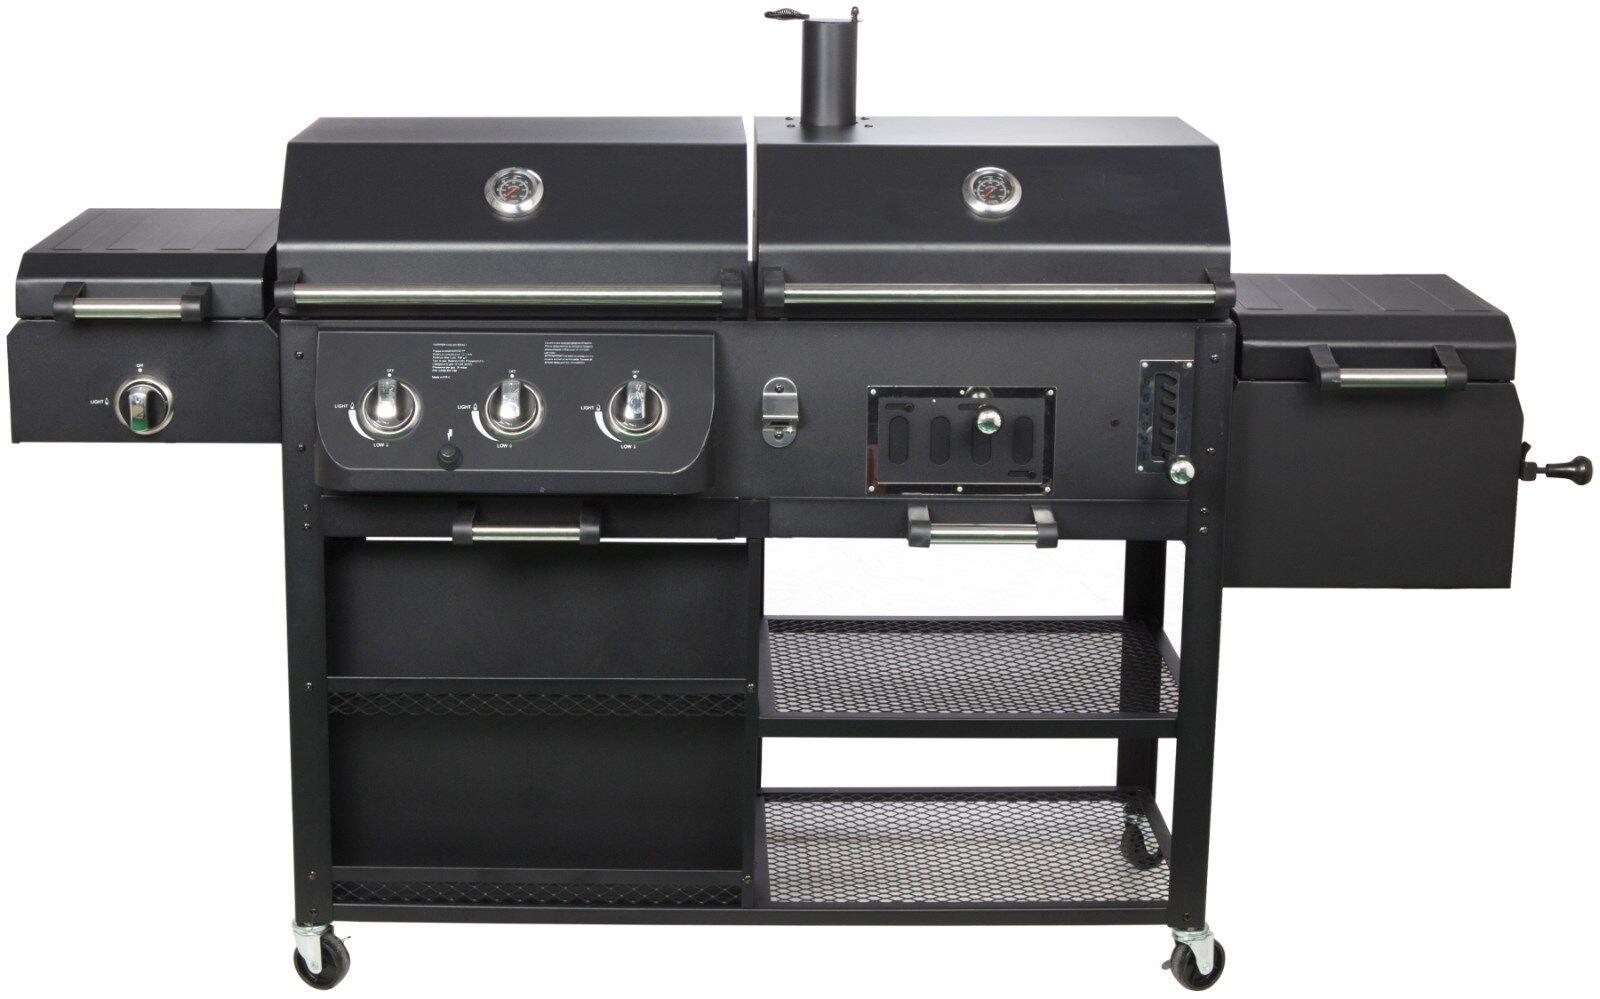 Enders Gasgrill Kansas 3 : Enders outdoor küche kansas pro sik profi turbo enders kansas